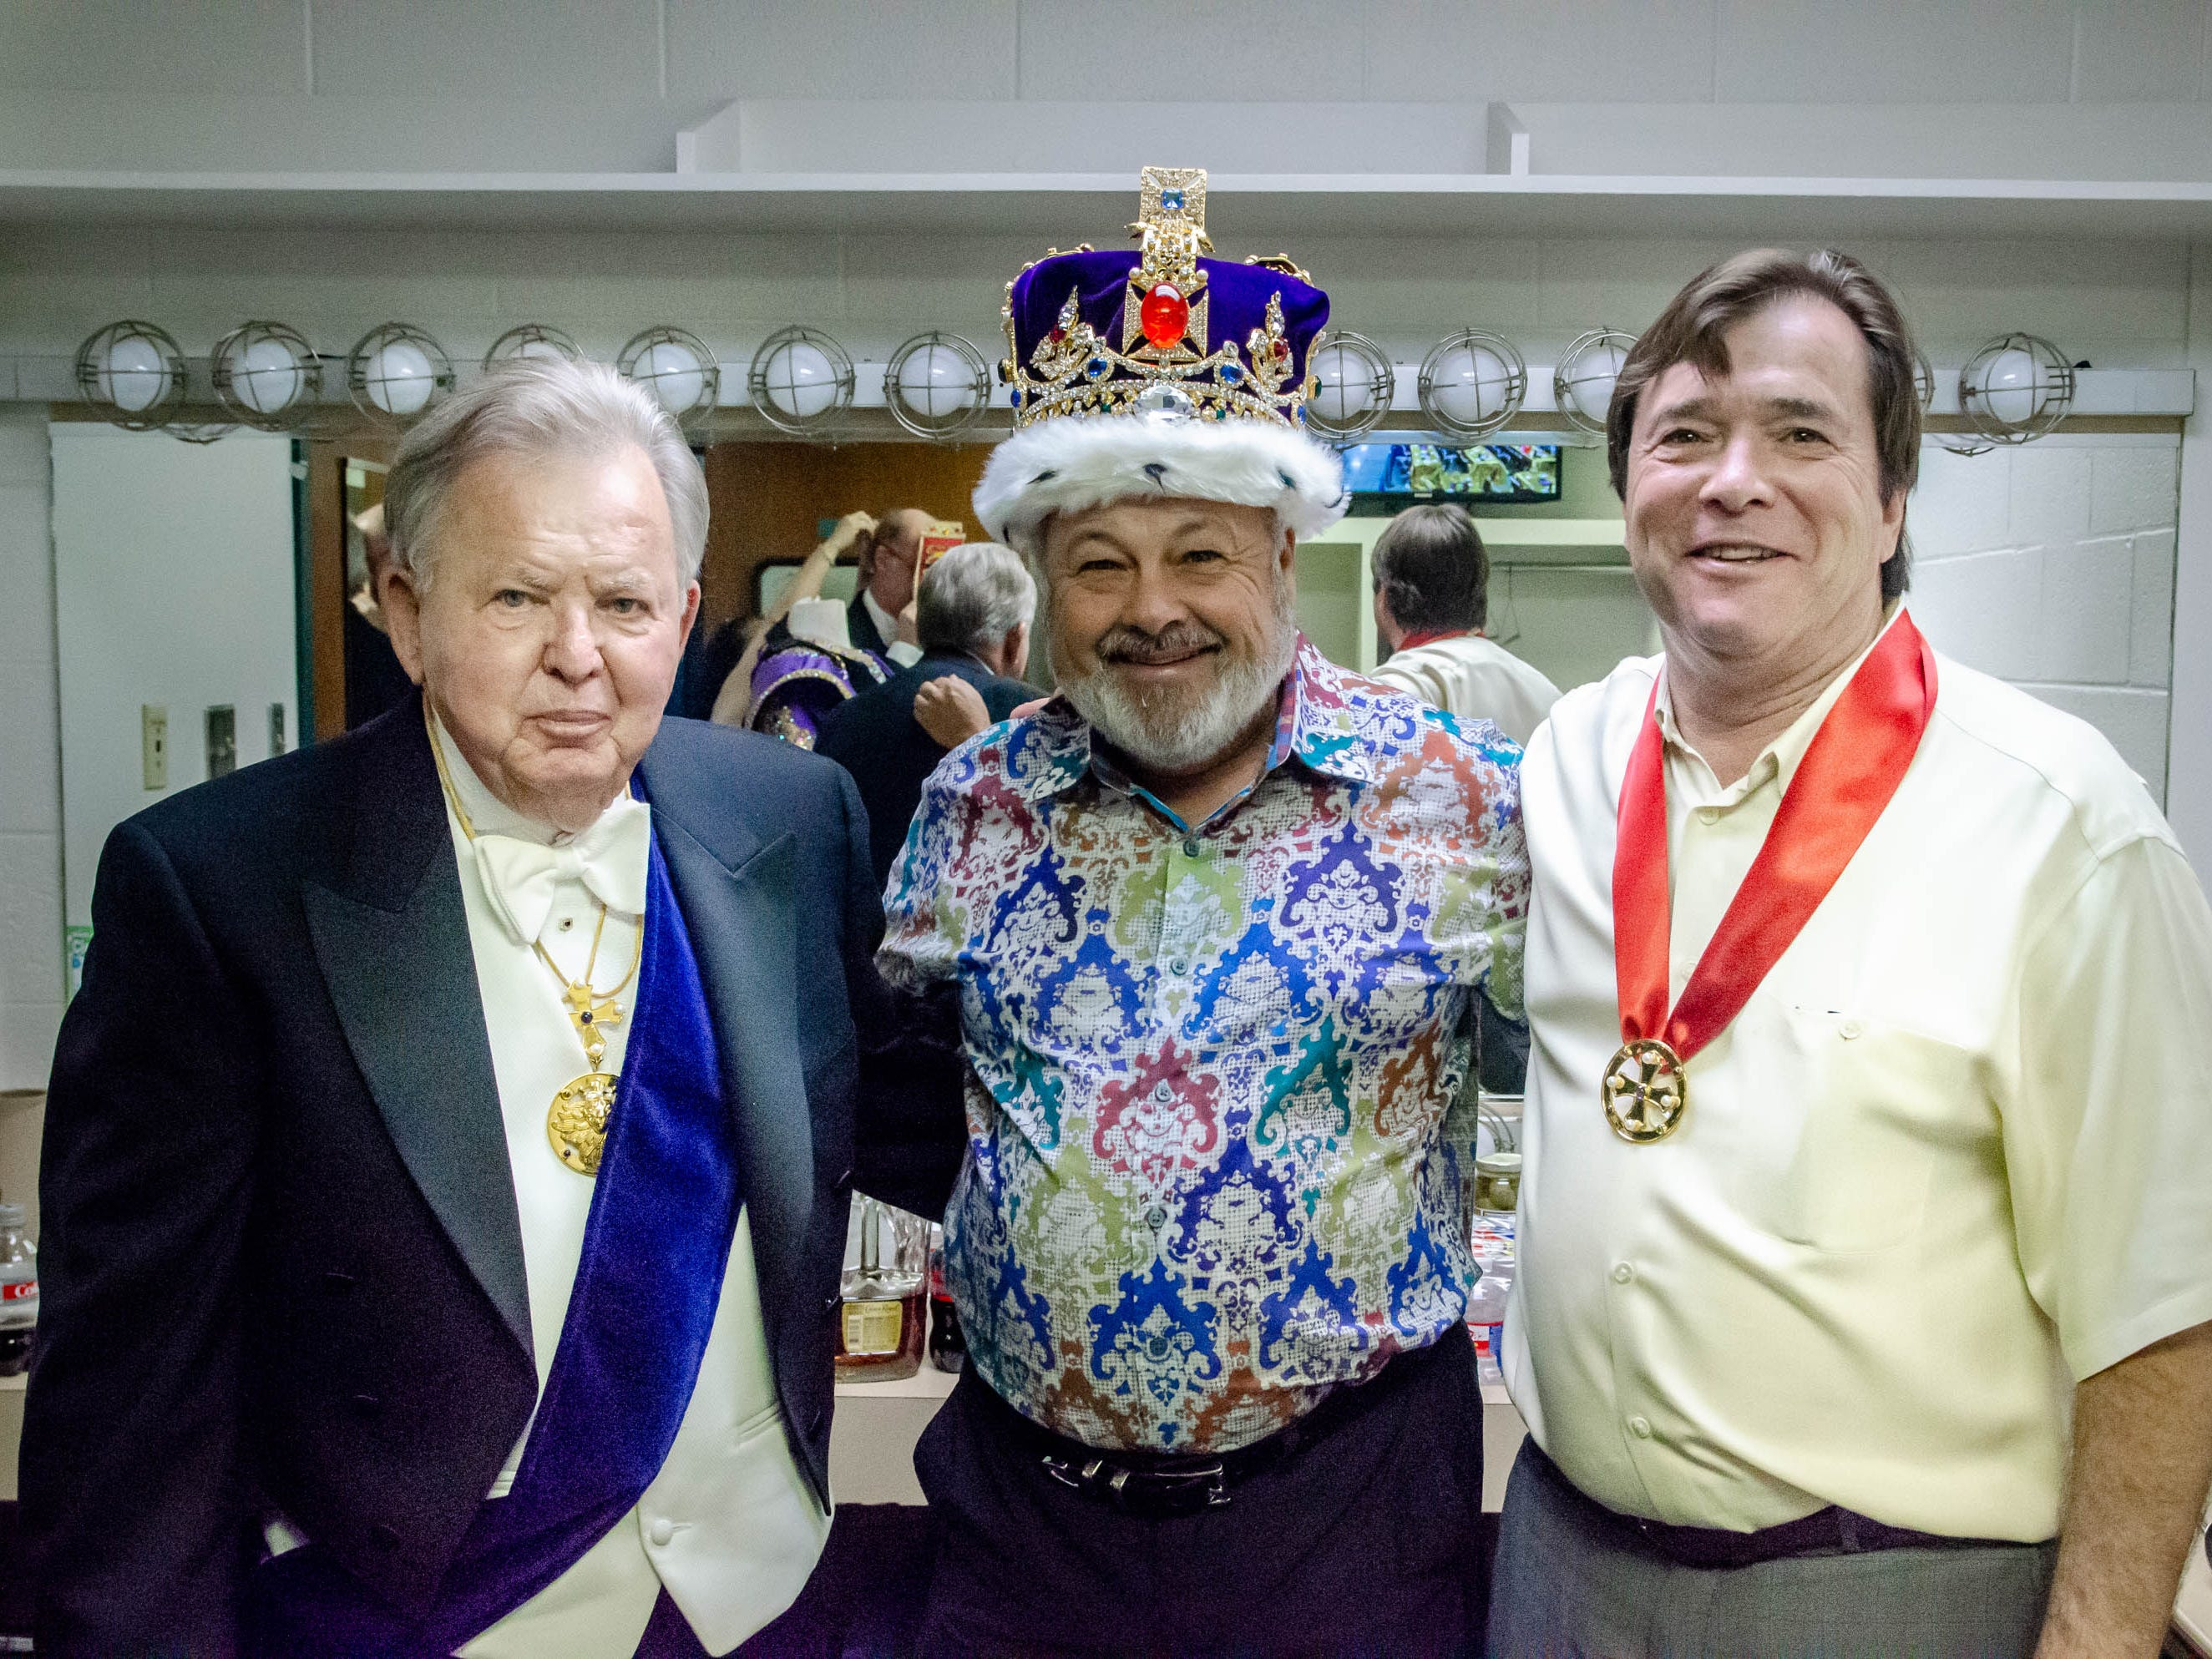 77th Annual Krew de Troubadours Mardi Gras Ball. King Richard Coeur de Lion and Sir Kenneth of Huntington preparing for the night.